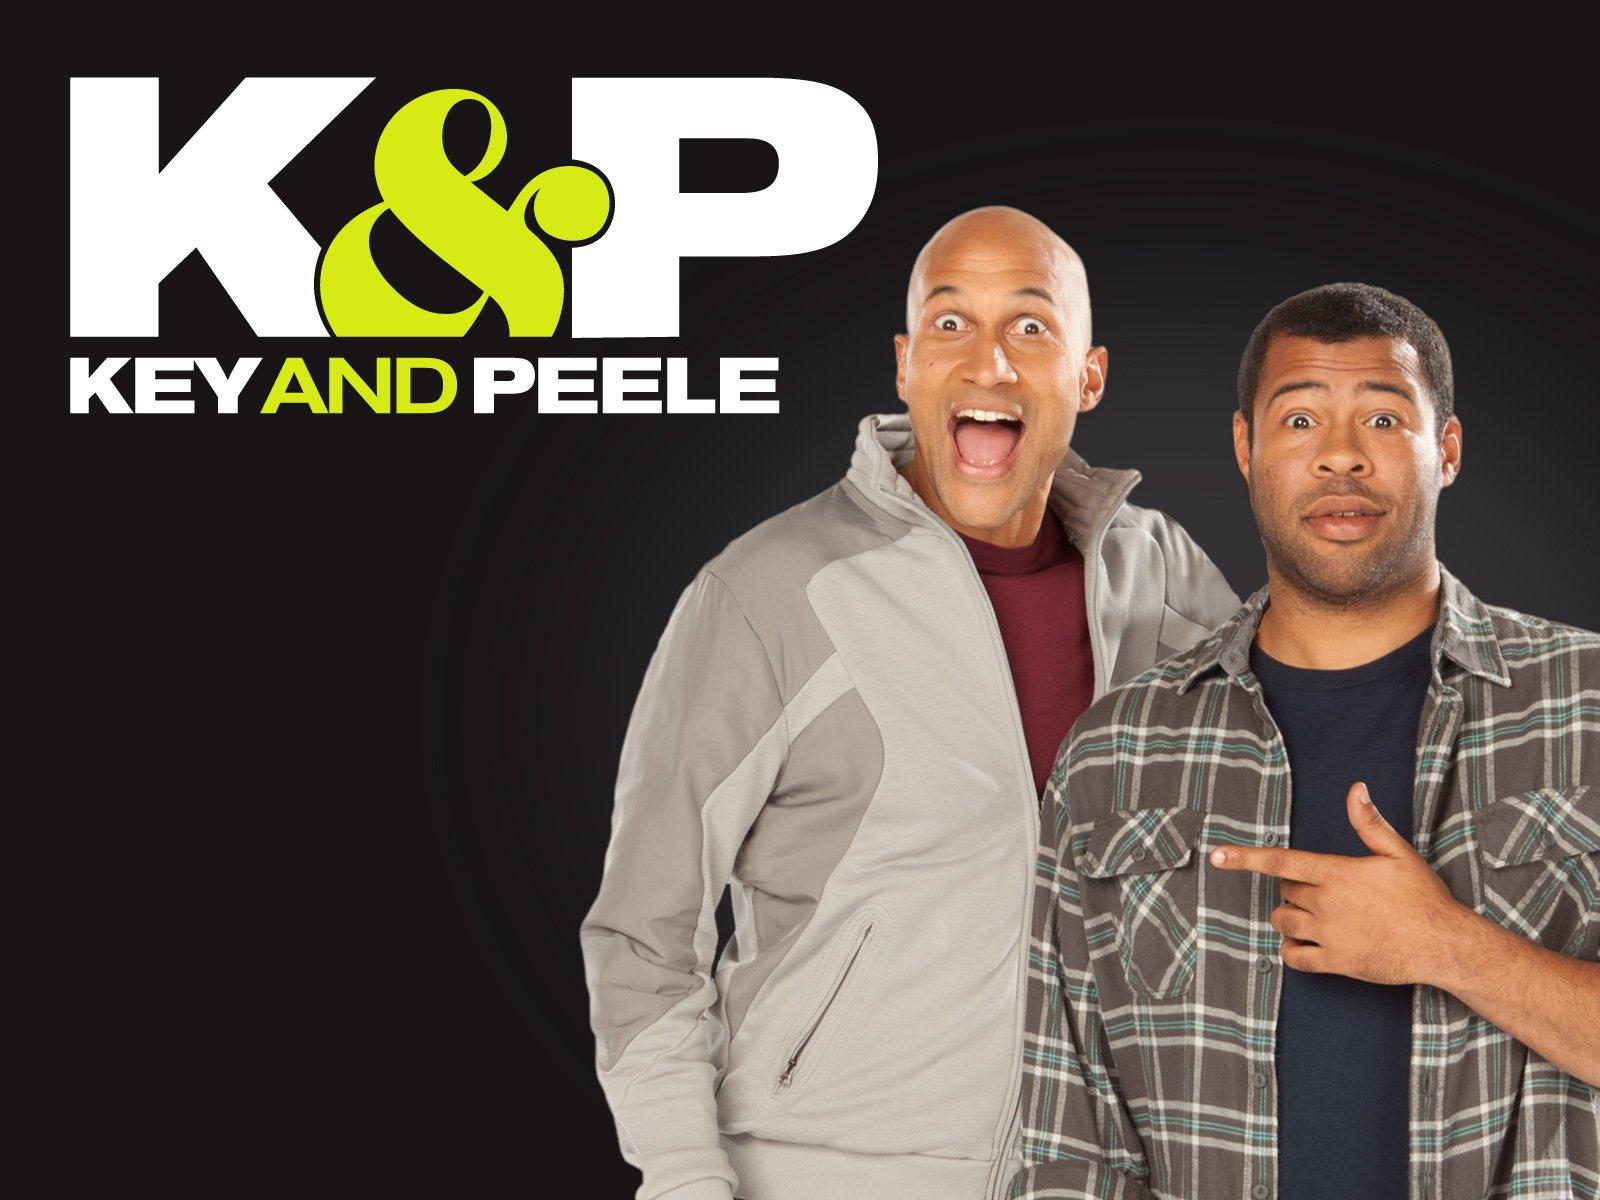 Key and peele hookup a mixed guy